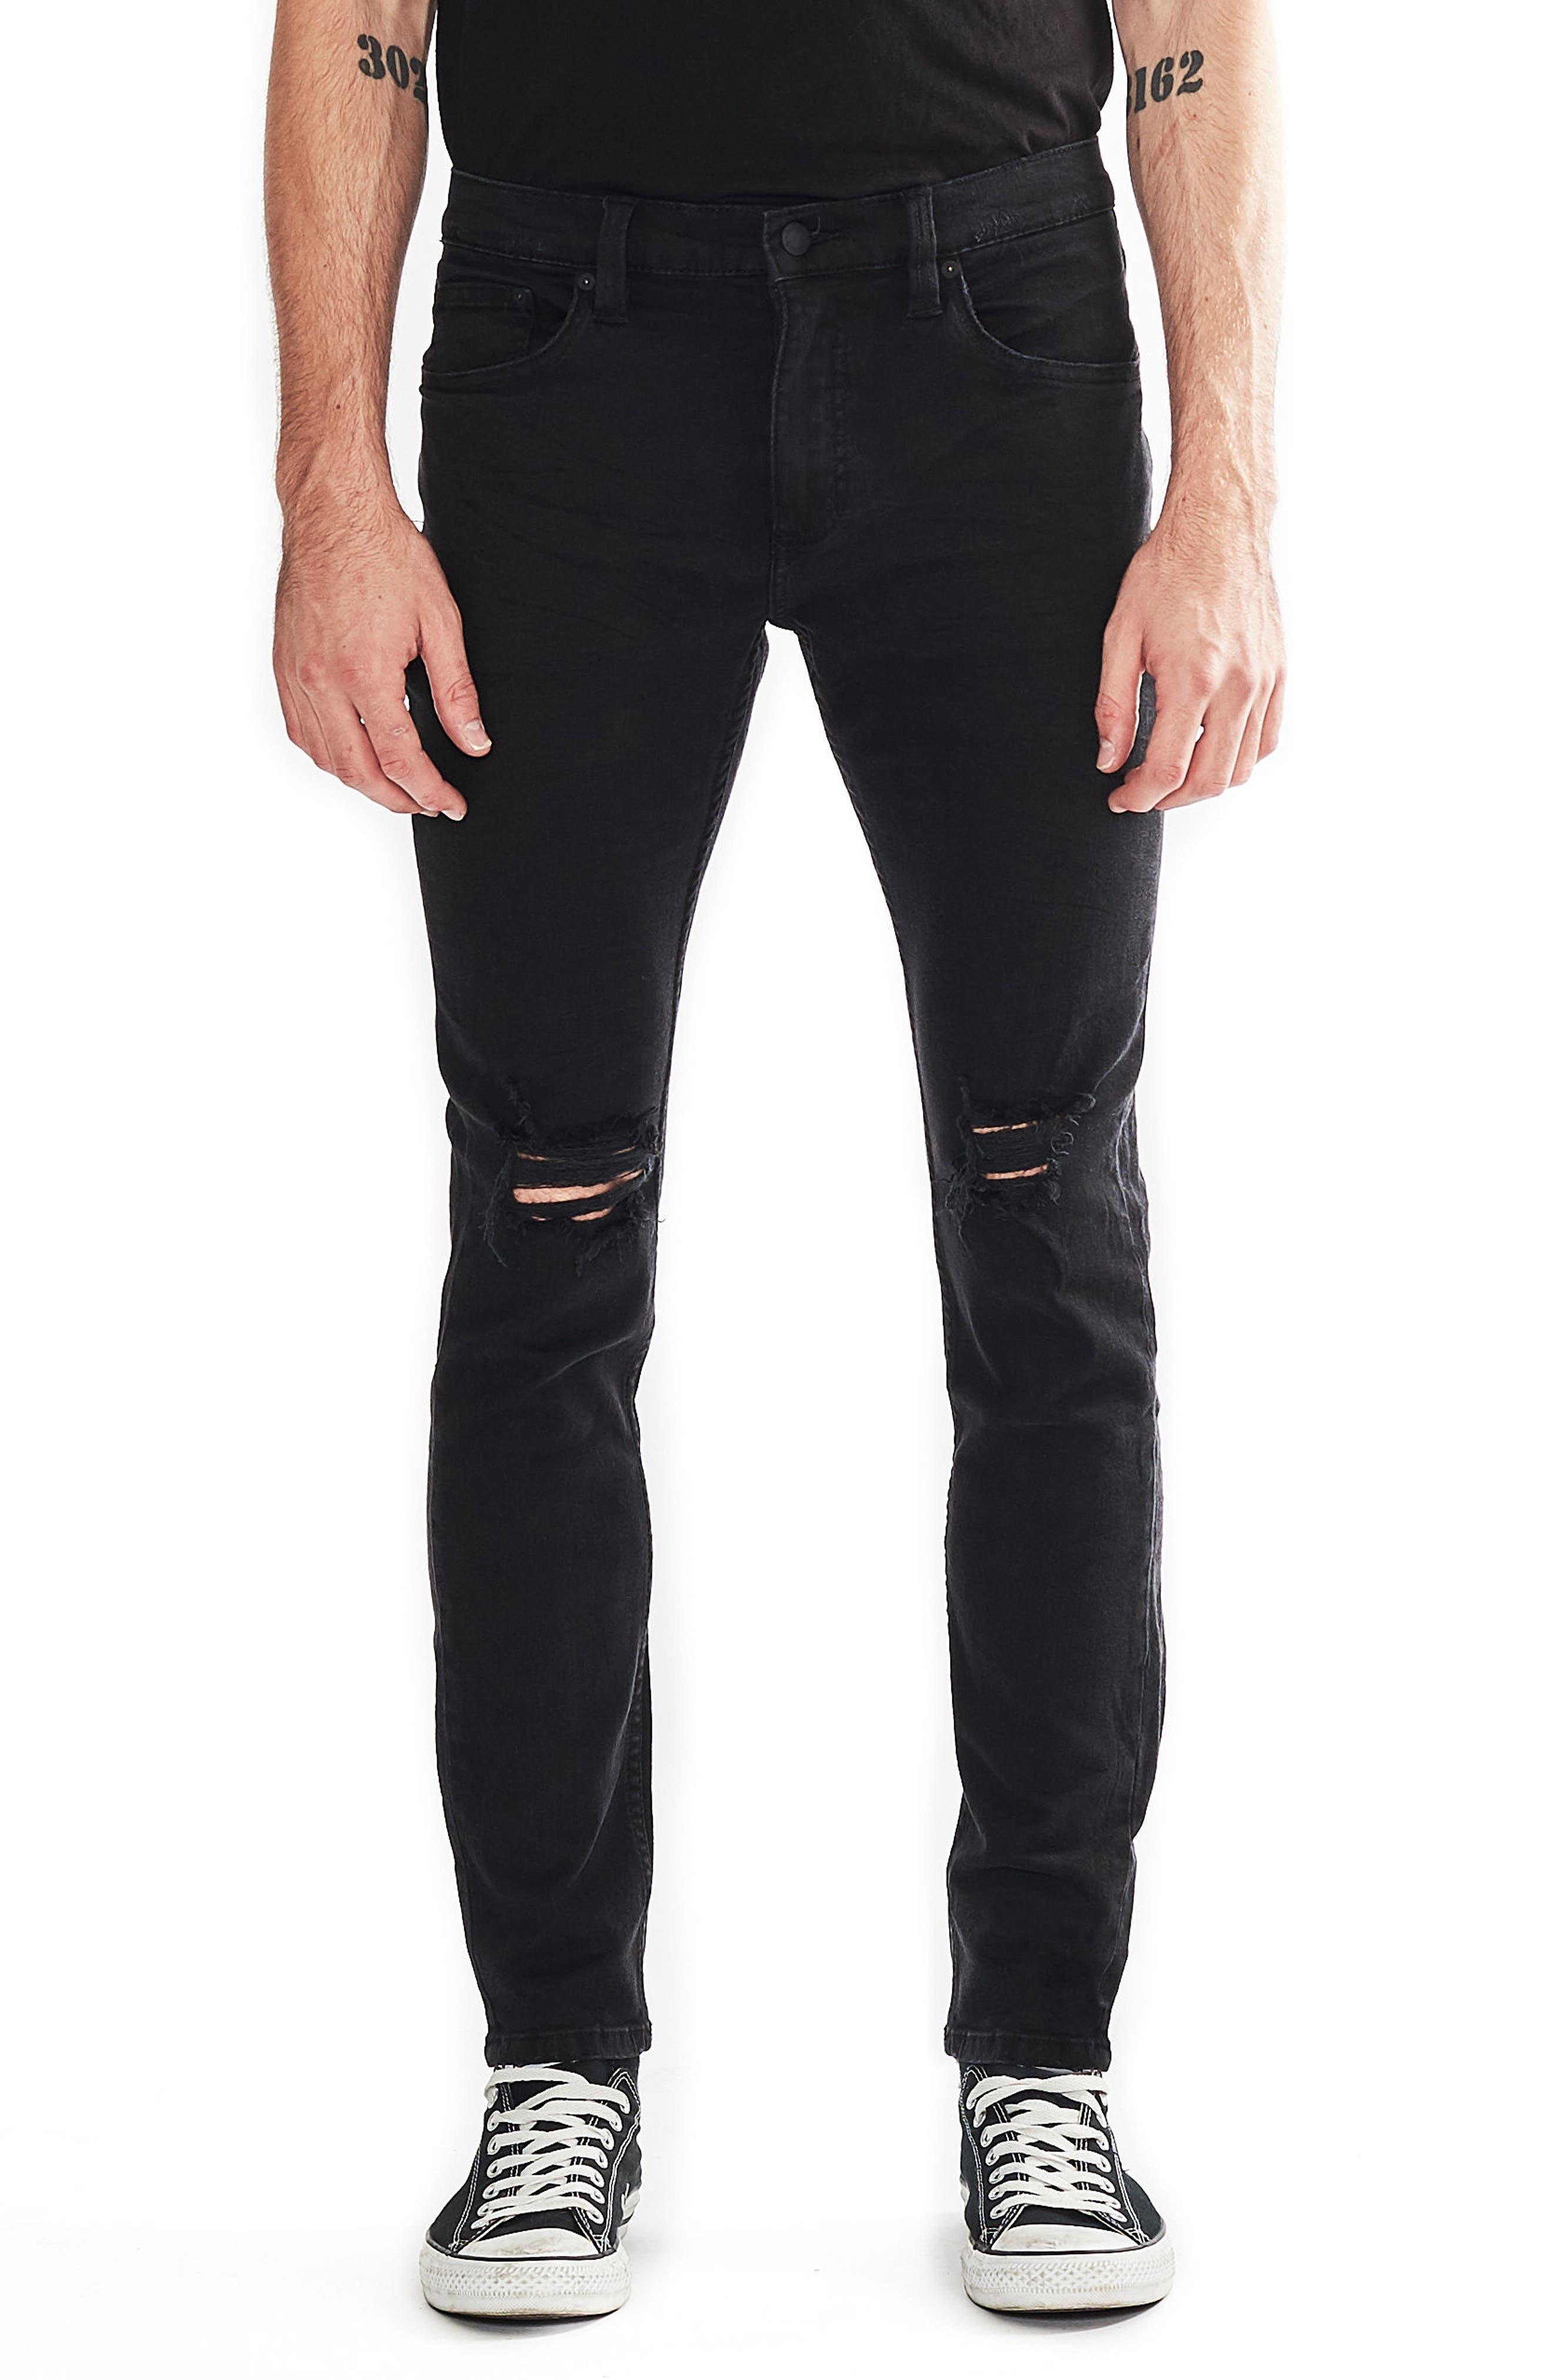 Stinger Skinny Fit Jeans,                             Main thumbnail 1, color,                             Black Hole